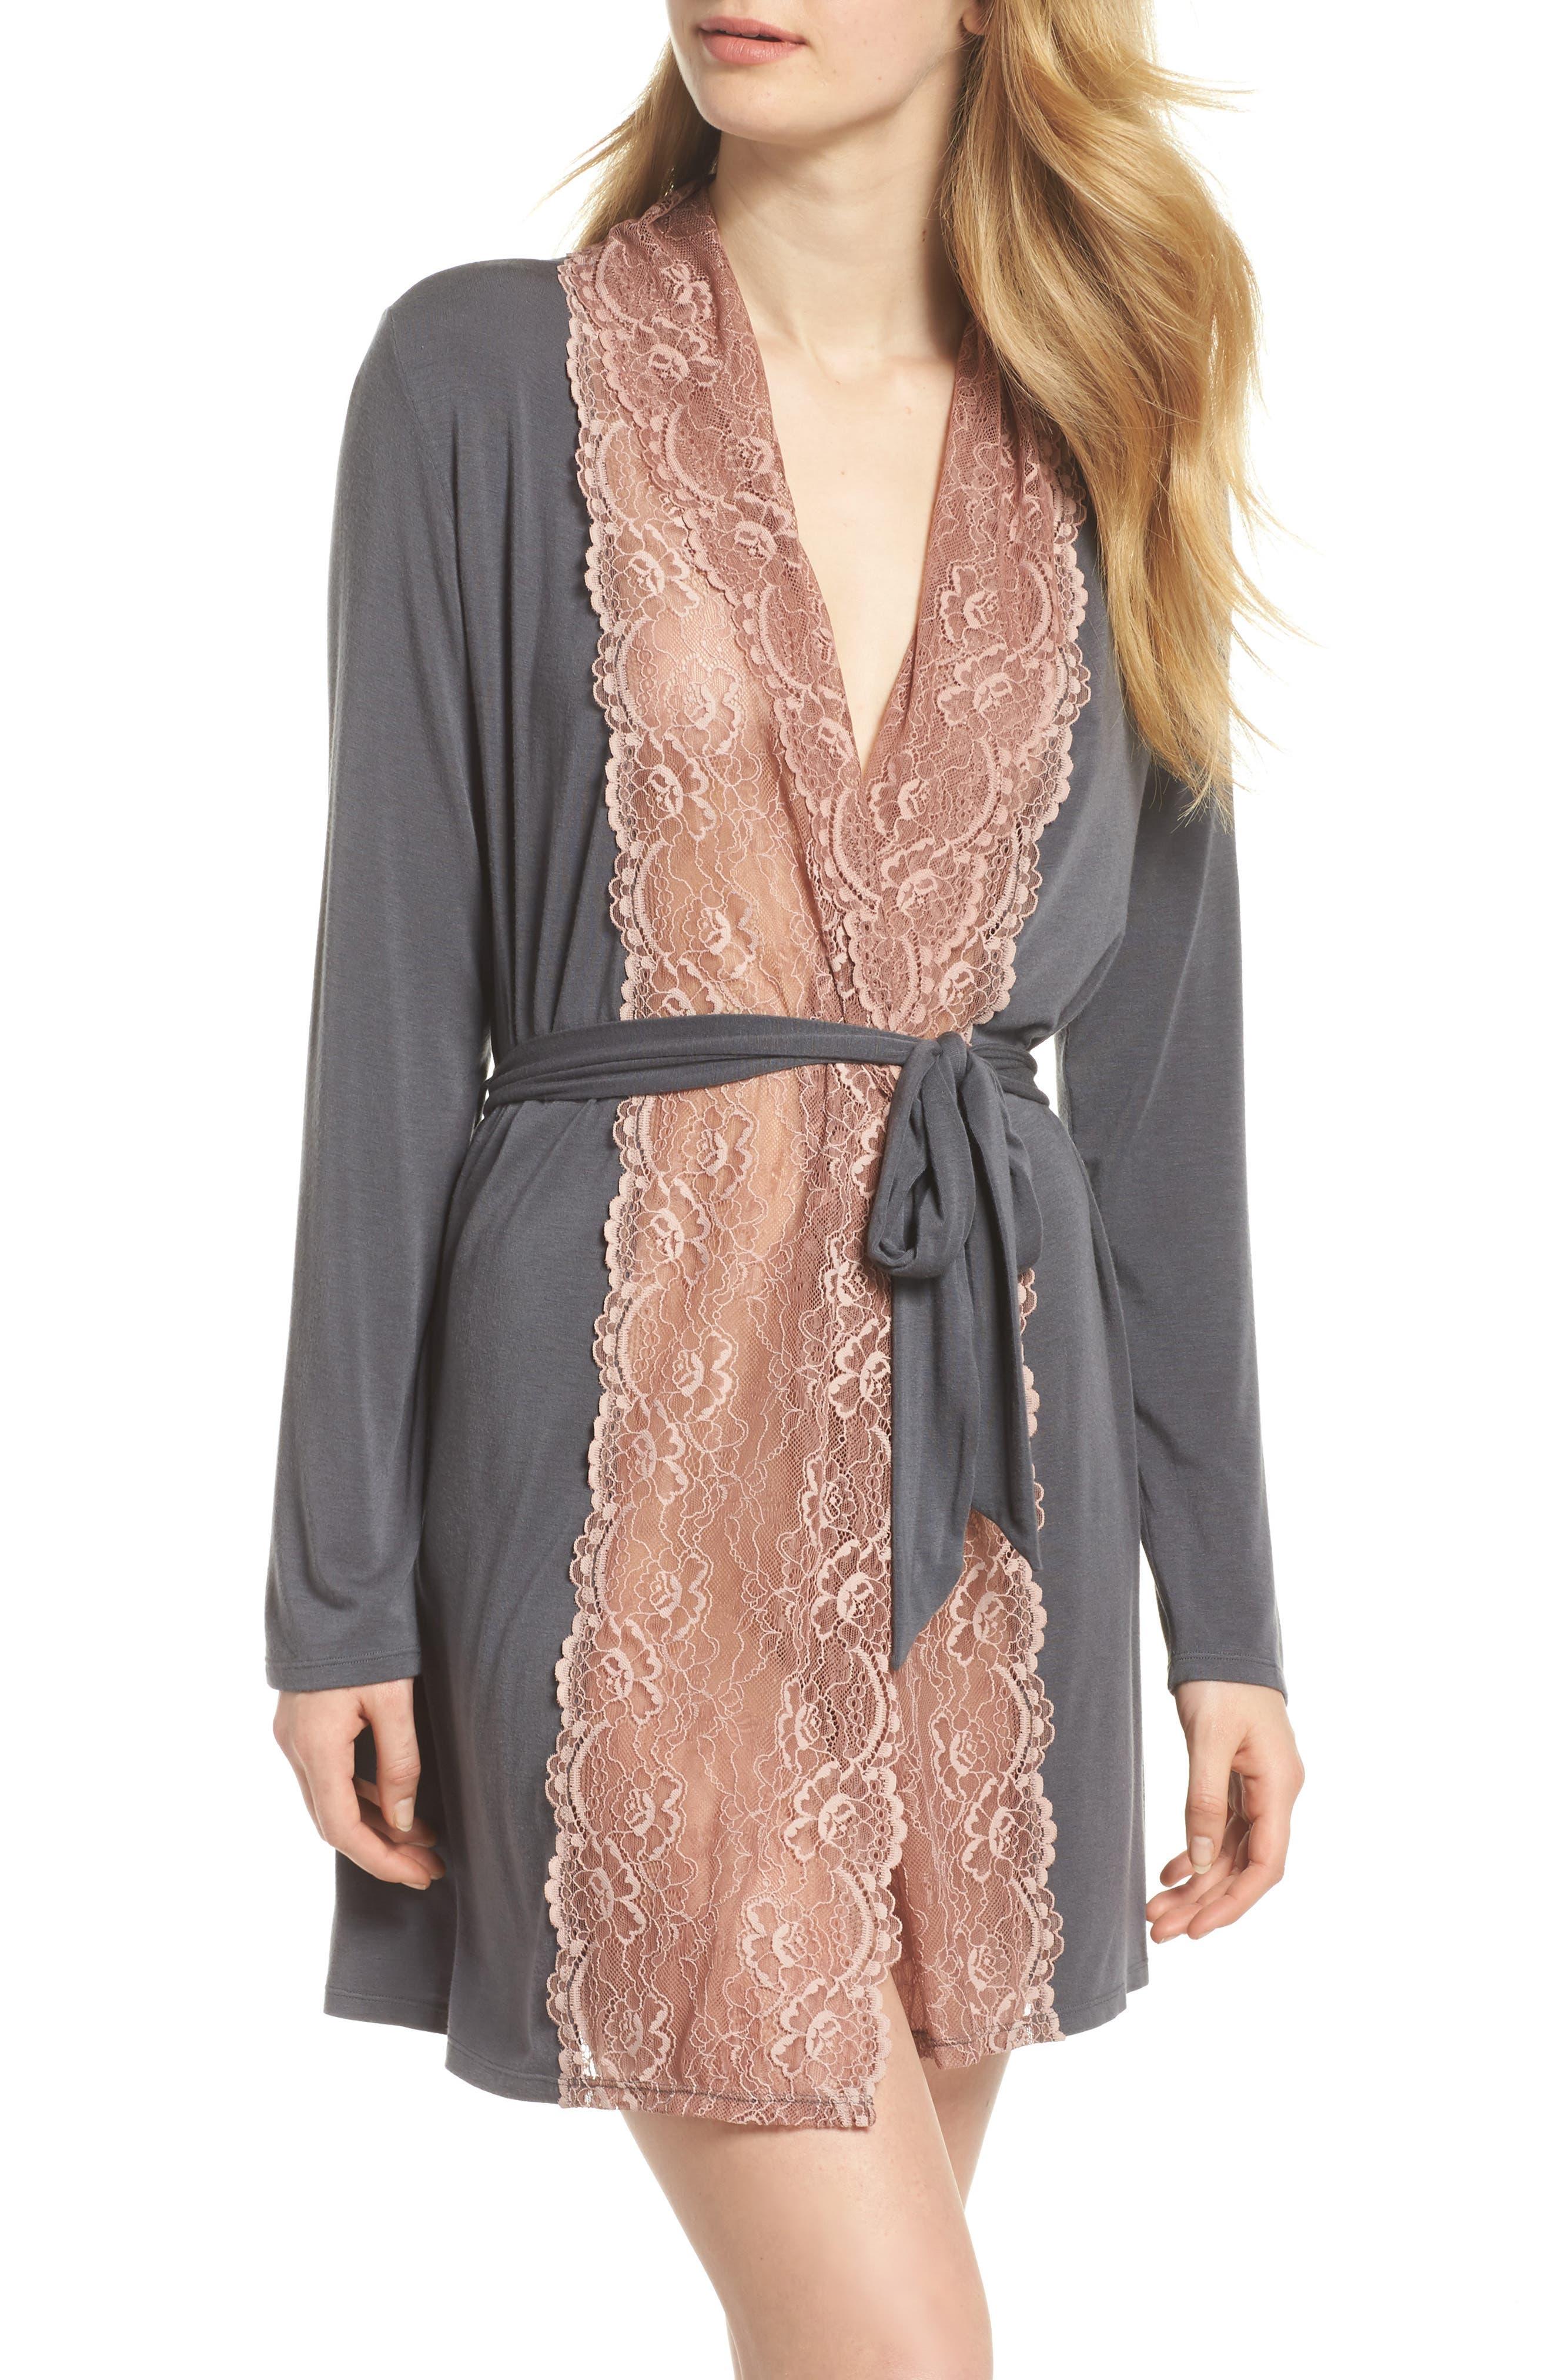 Vintage Nightgowns, Pajamas, Baby Dolls, Robes Womens Samantha Chang Lace Trim Robe $125.00 AT vintagedancer.com